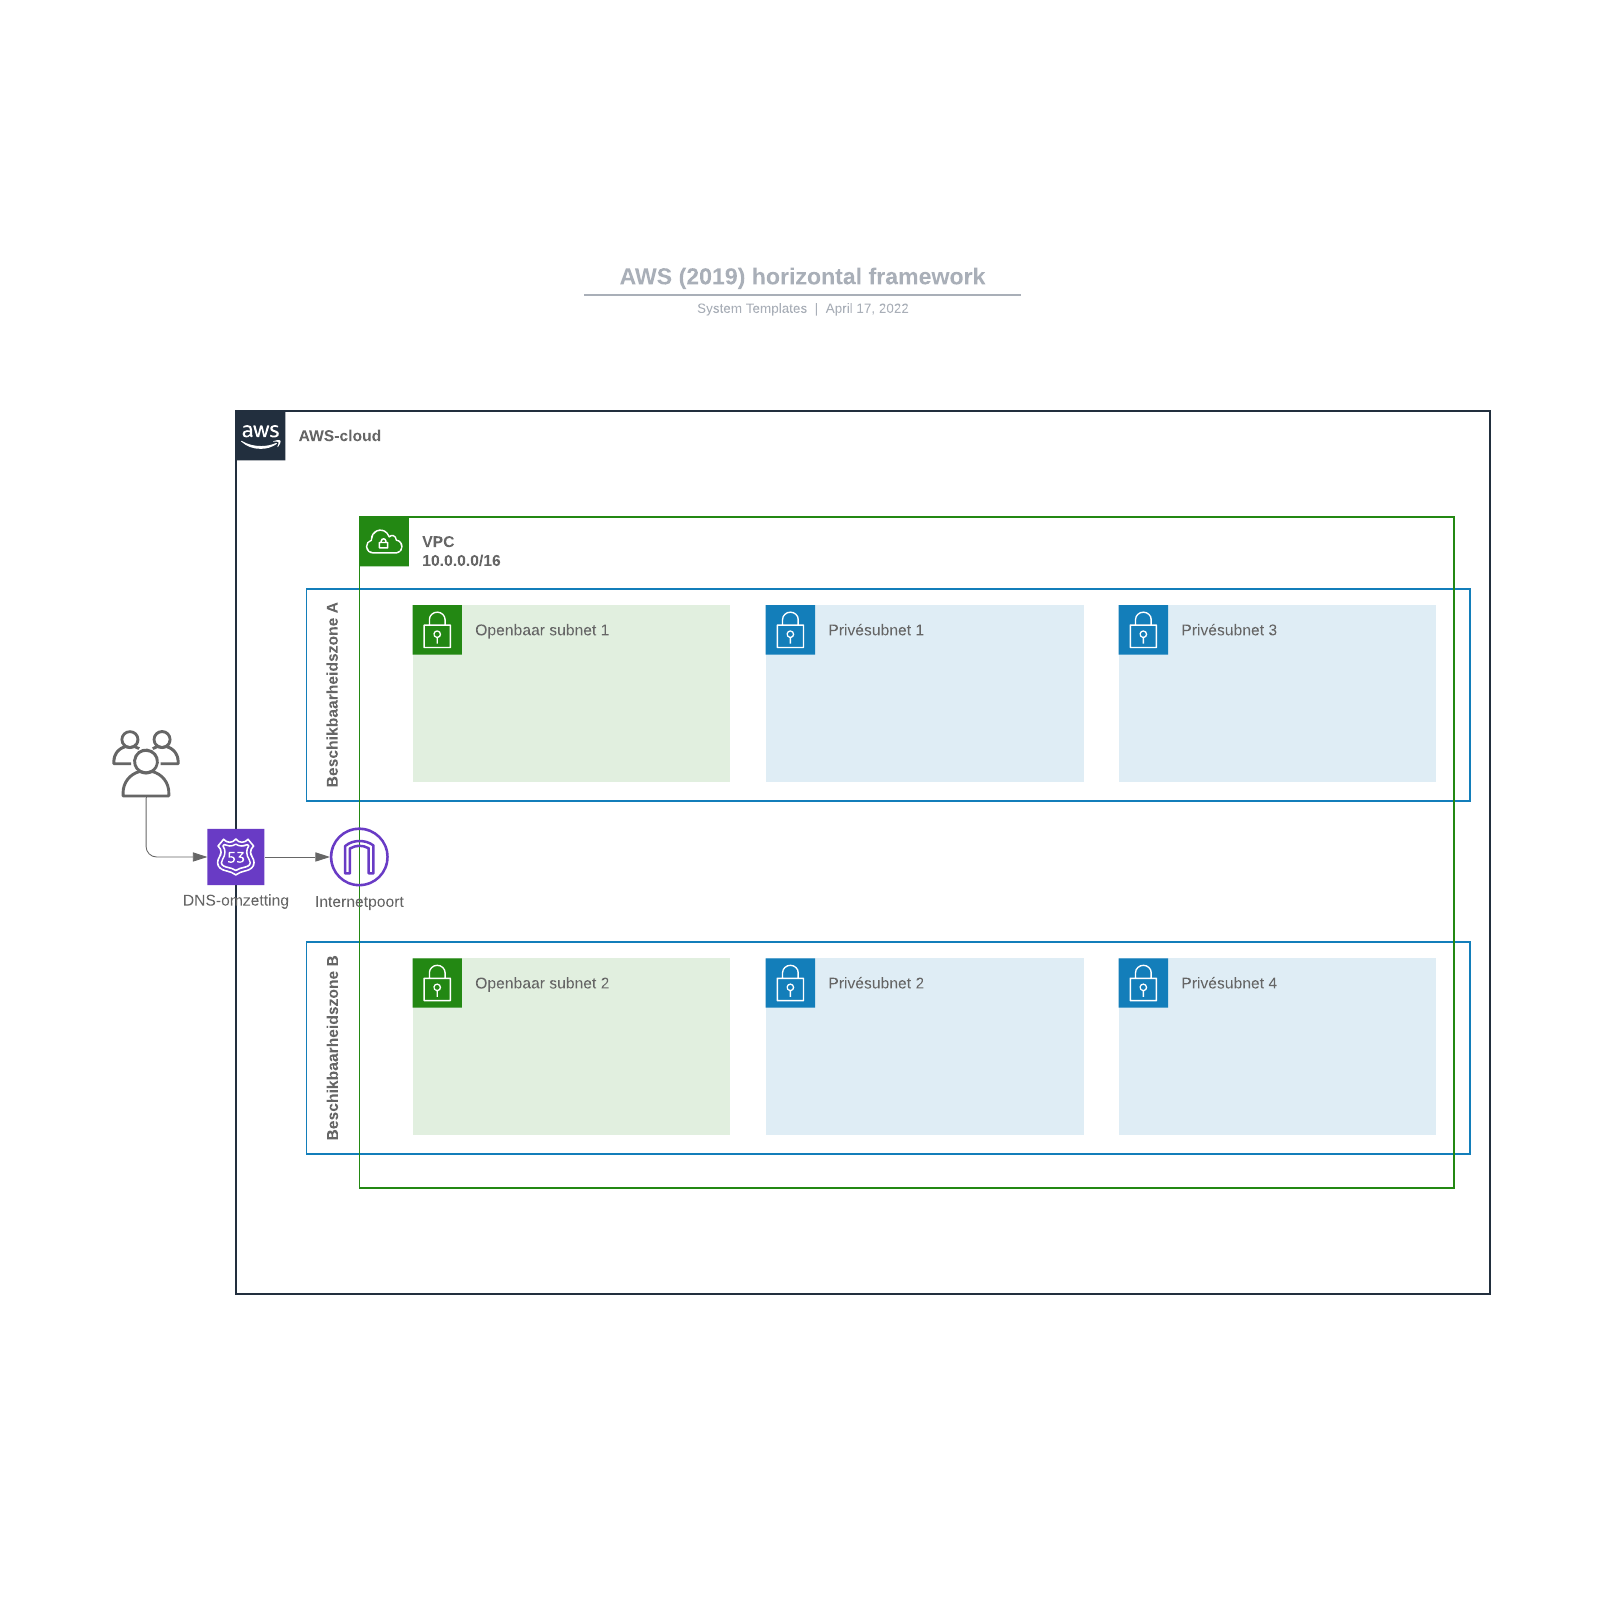 AWS (2019) horizontal framework